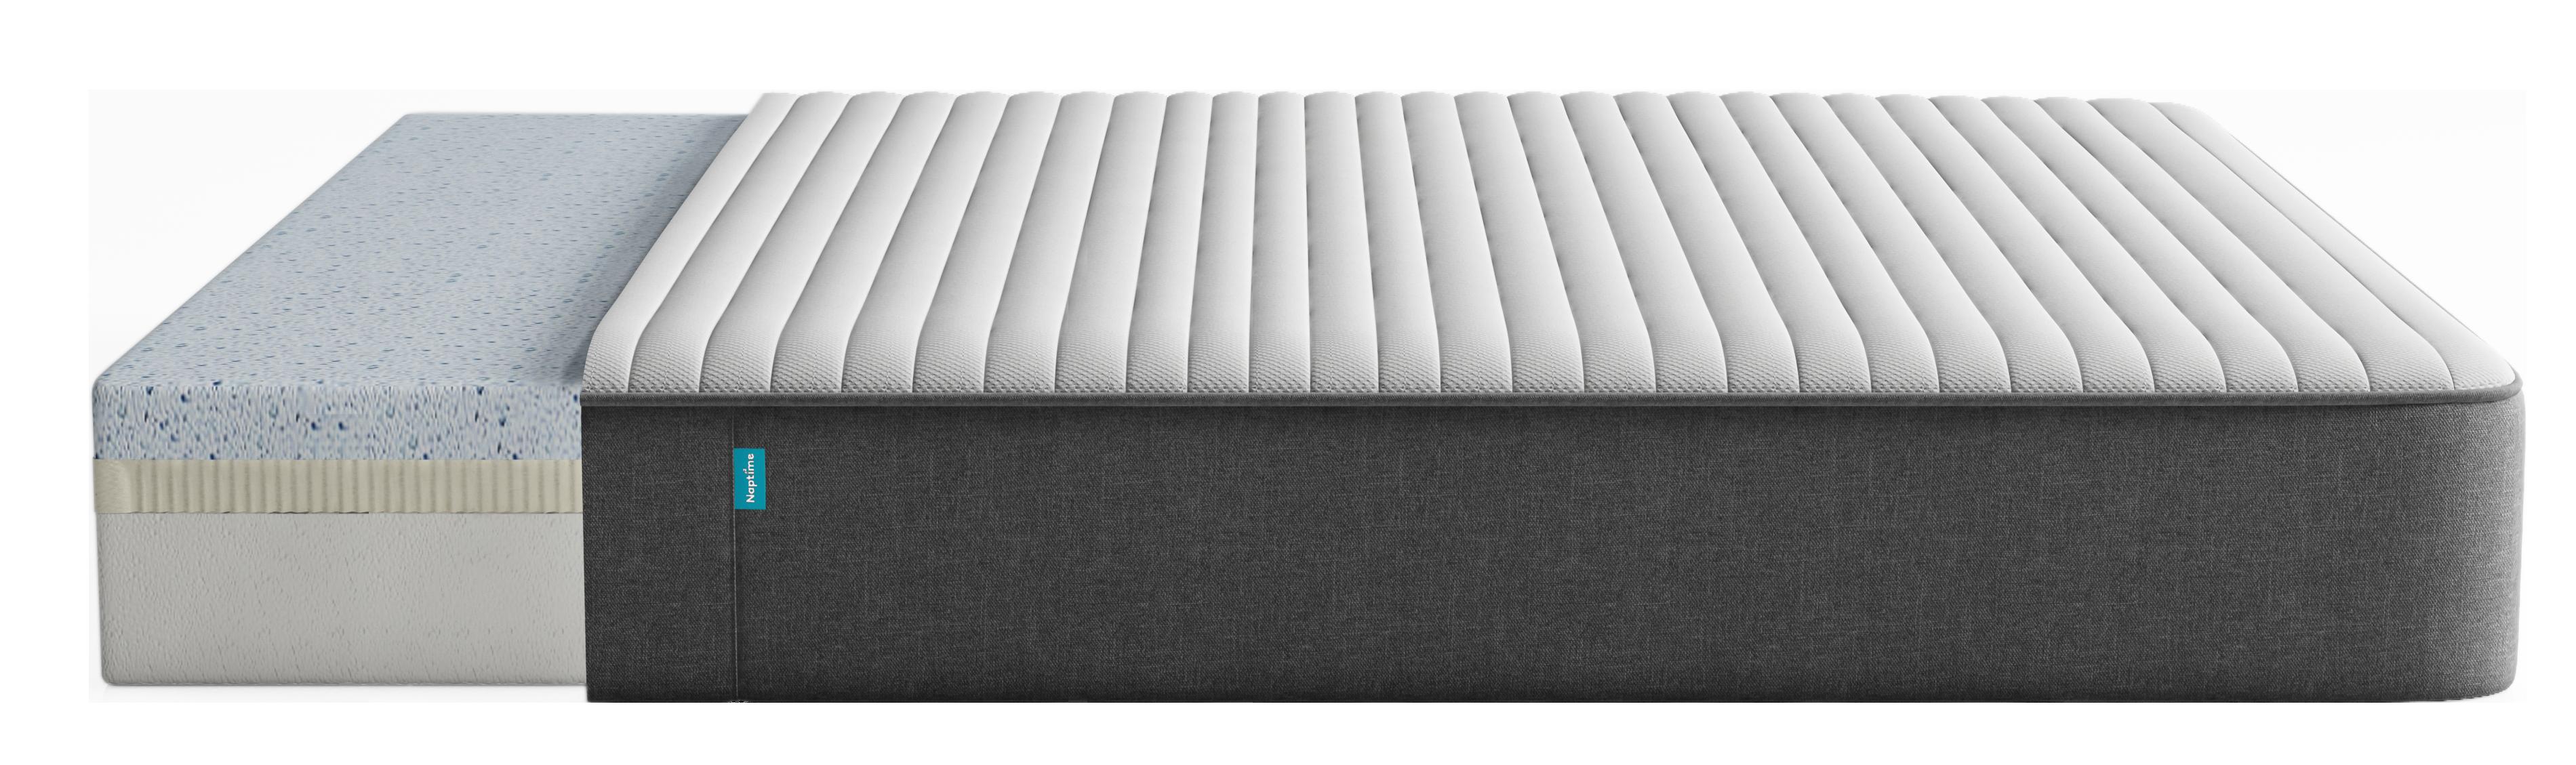 Memory foam mattress australia. Nap clipart soft bed